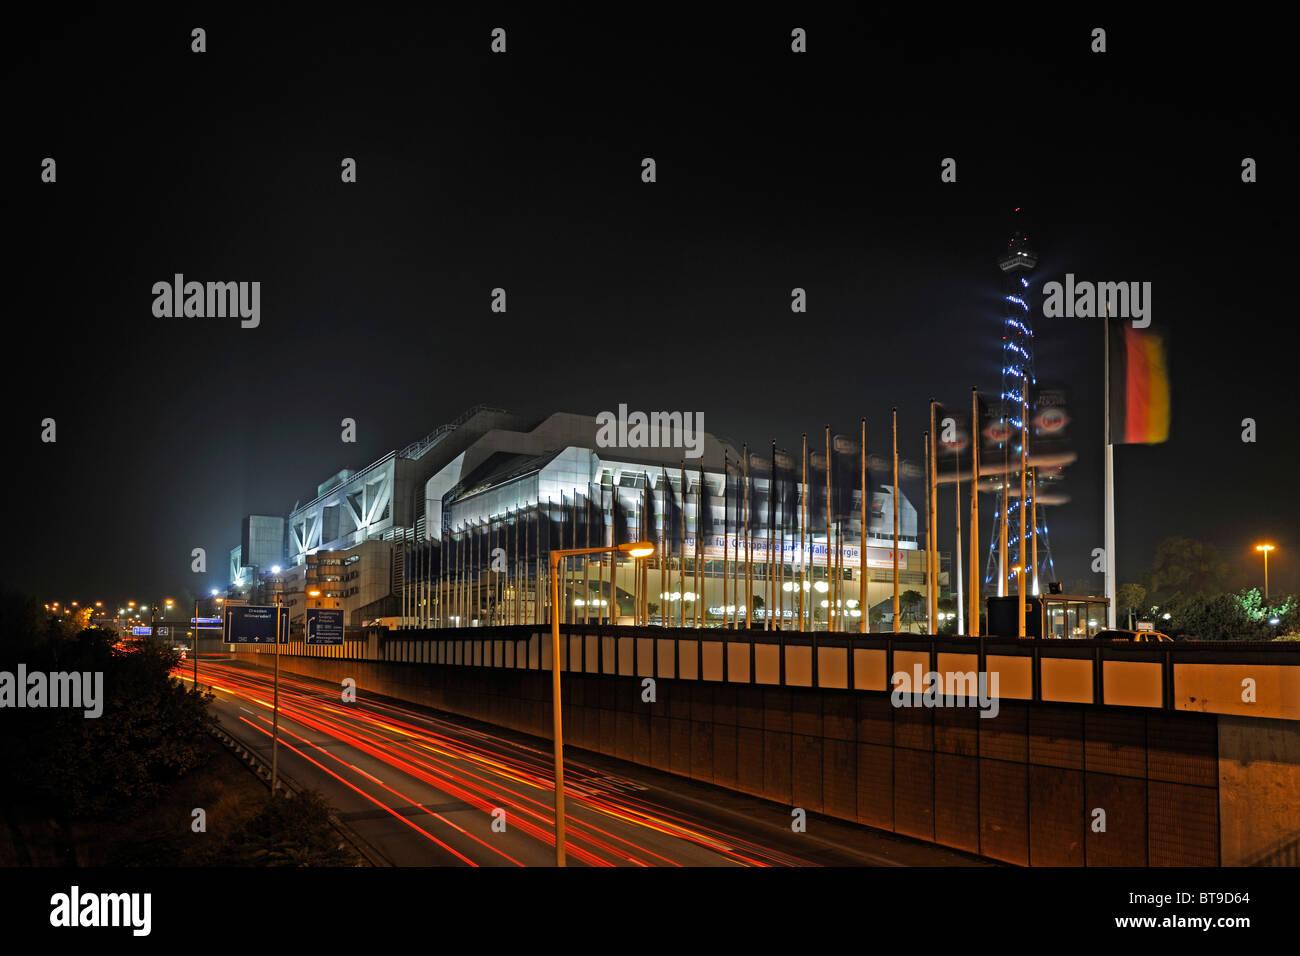 International Congress Center, ICC, night scene, Berlin, Germany, Europe - Stock Image